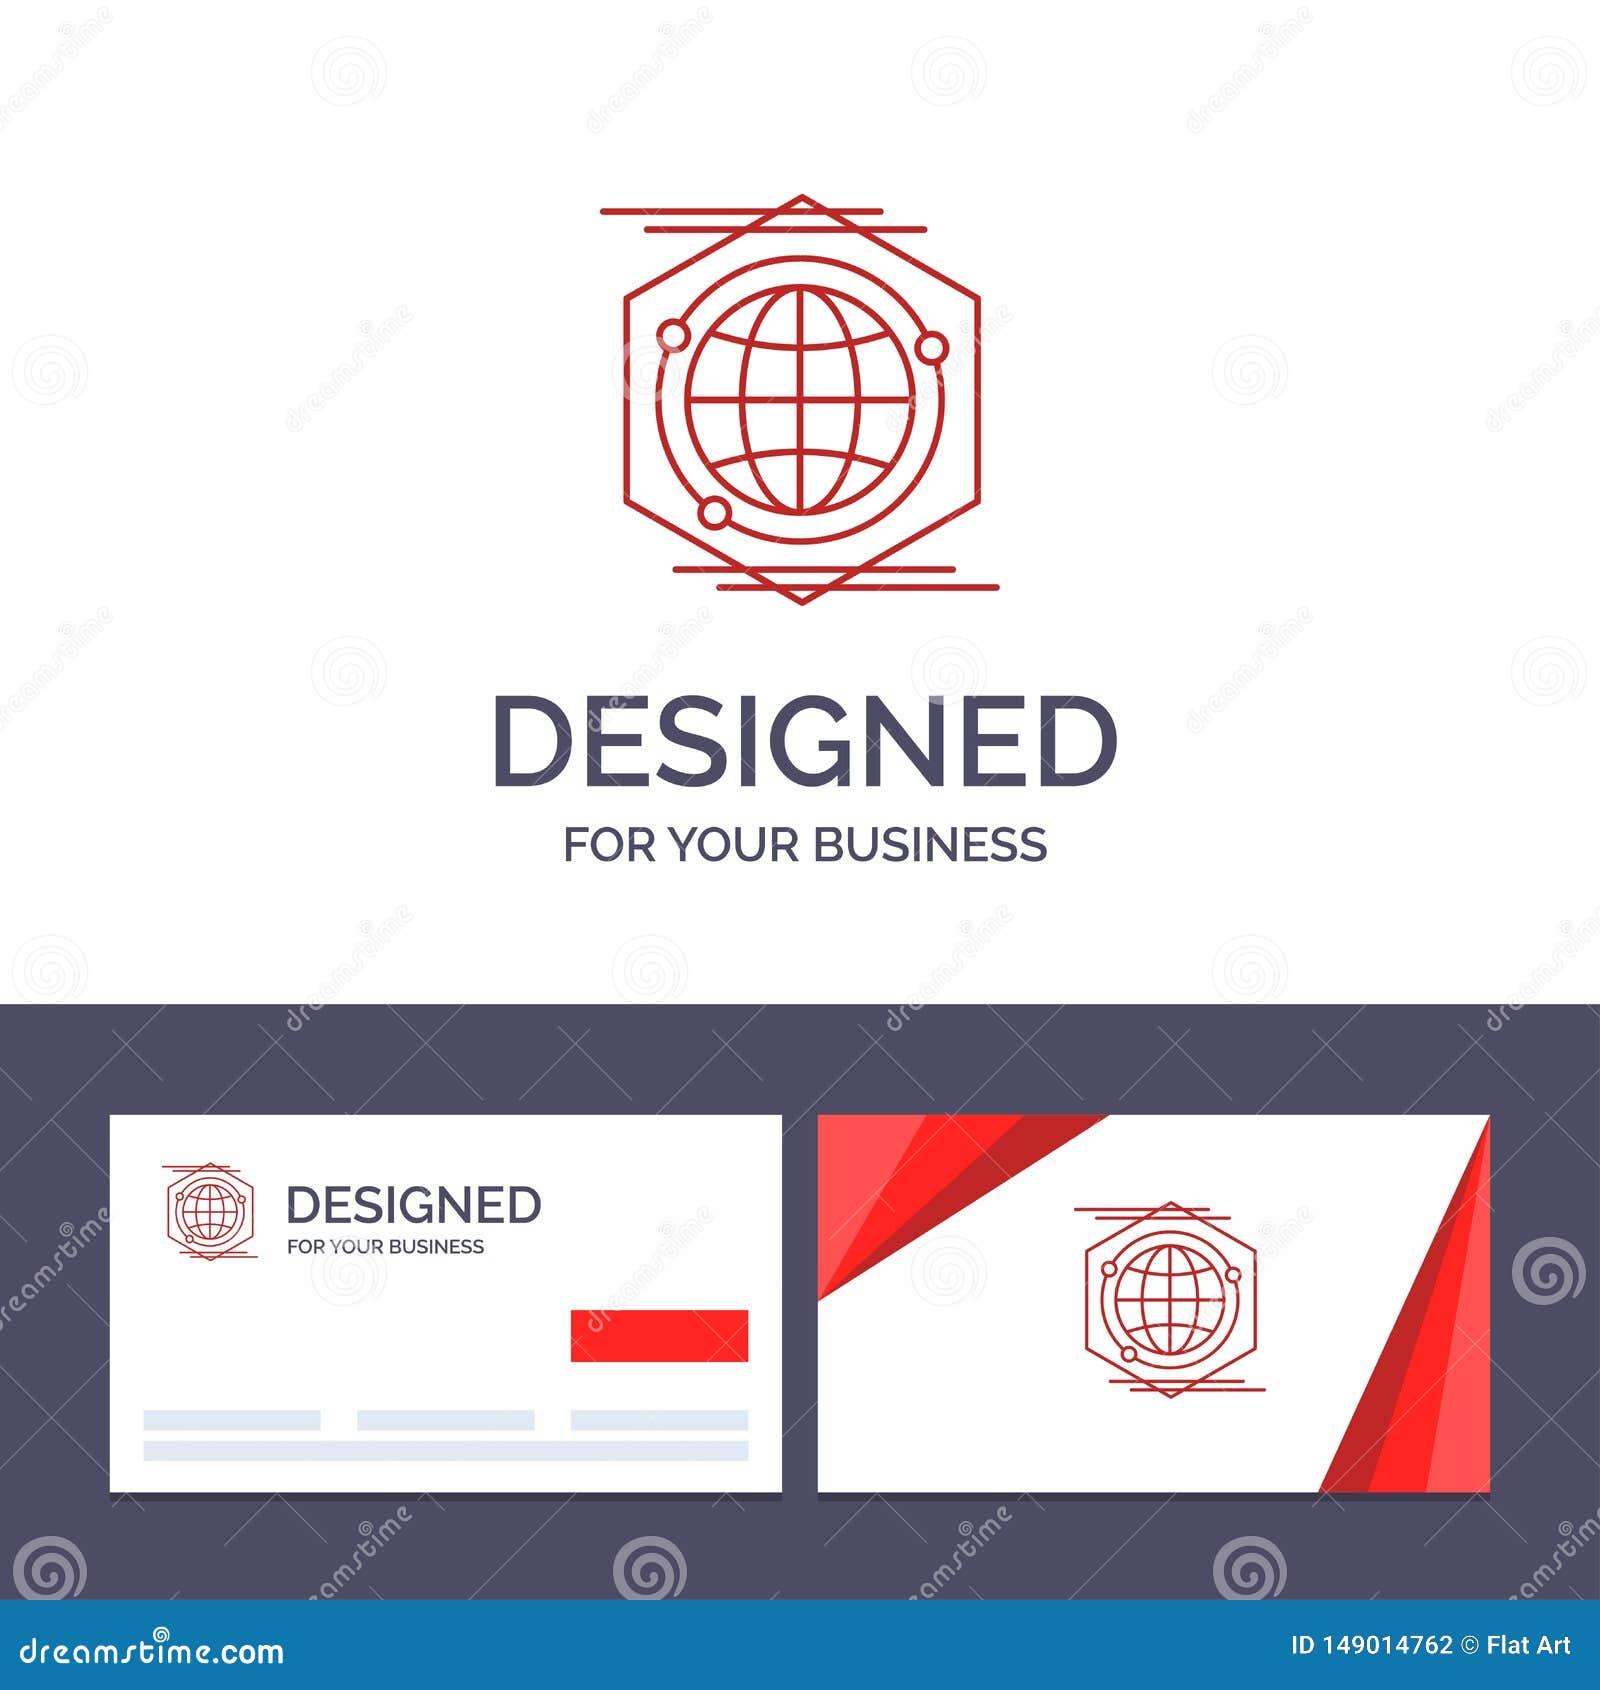 Kreative Visitenkarte- und Logoschablone Kugel, Polygon, Raum, Ideen-Vektor-Illustration